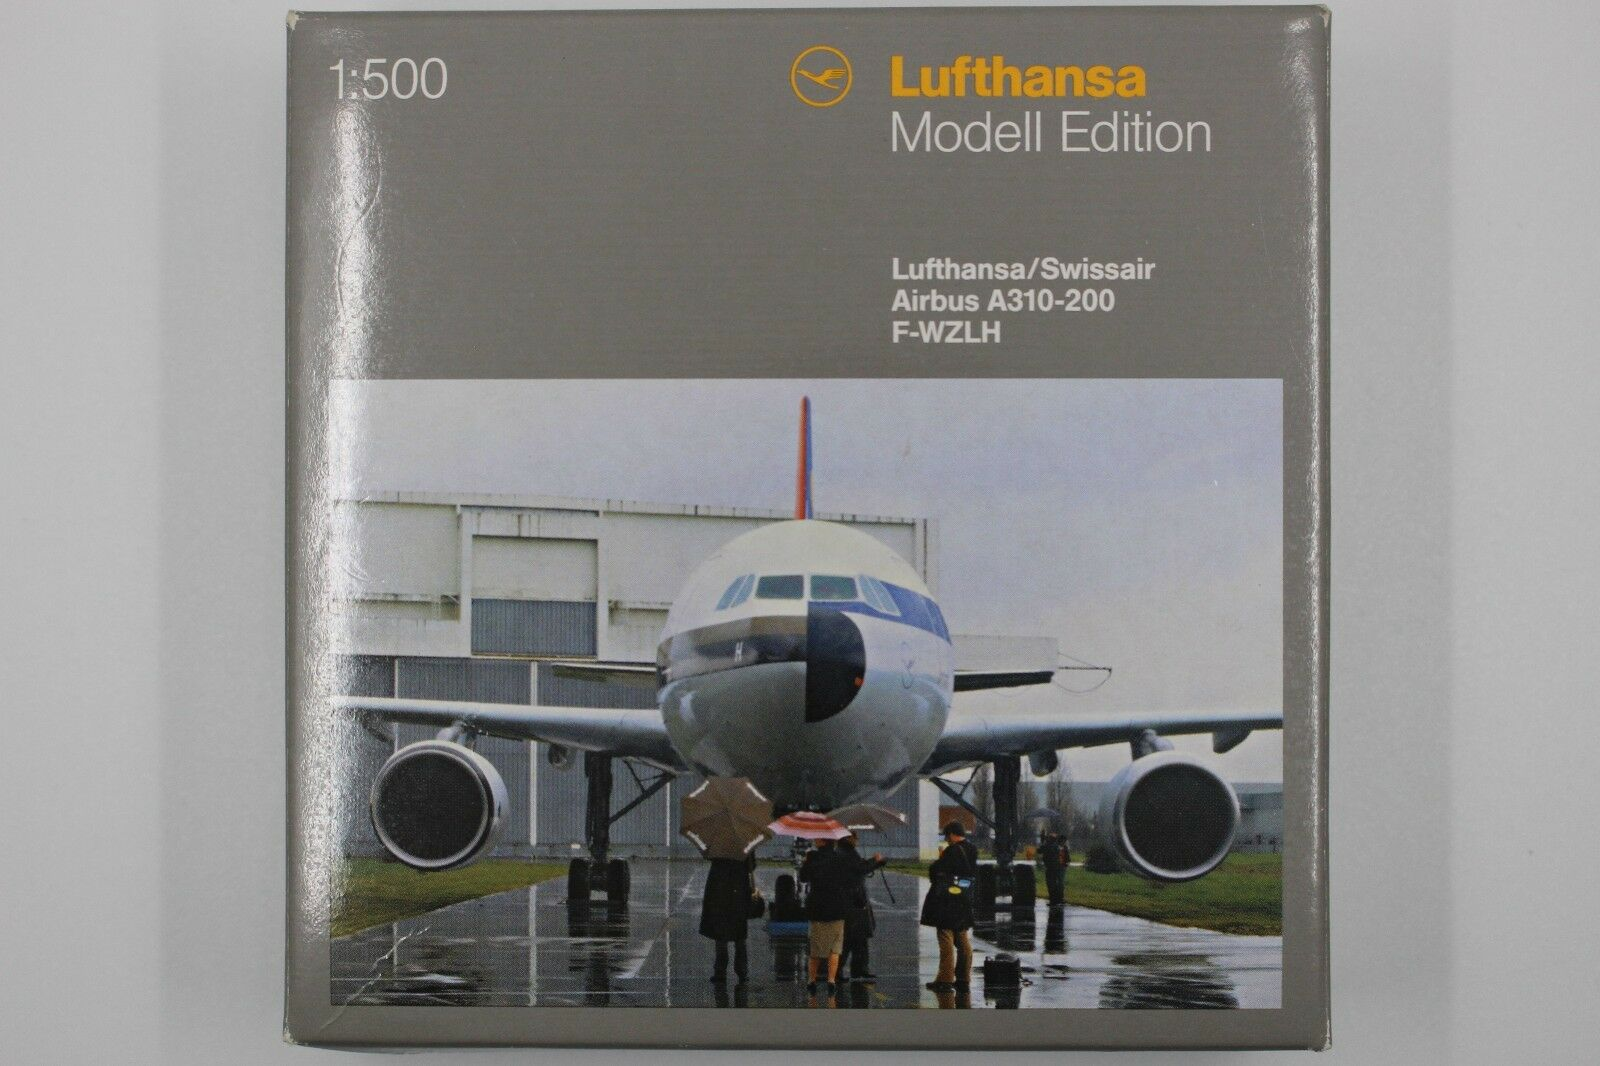 risparmia fino al 70% di sconto Herpa Wings 1 500 Lufthansa Swissair Swissair Swissair a310-200 Mixed Colours (501170) Limited  una marca di lusso